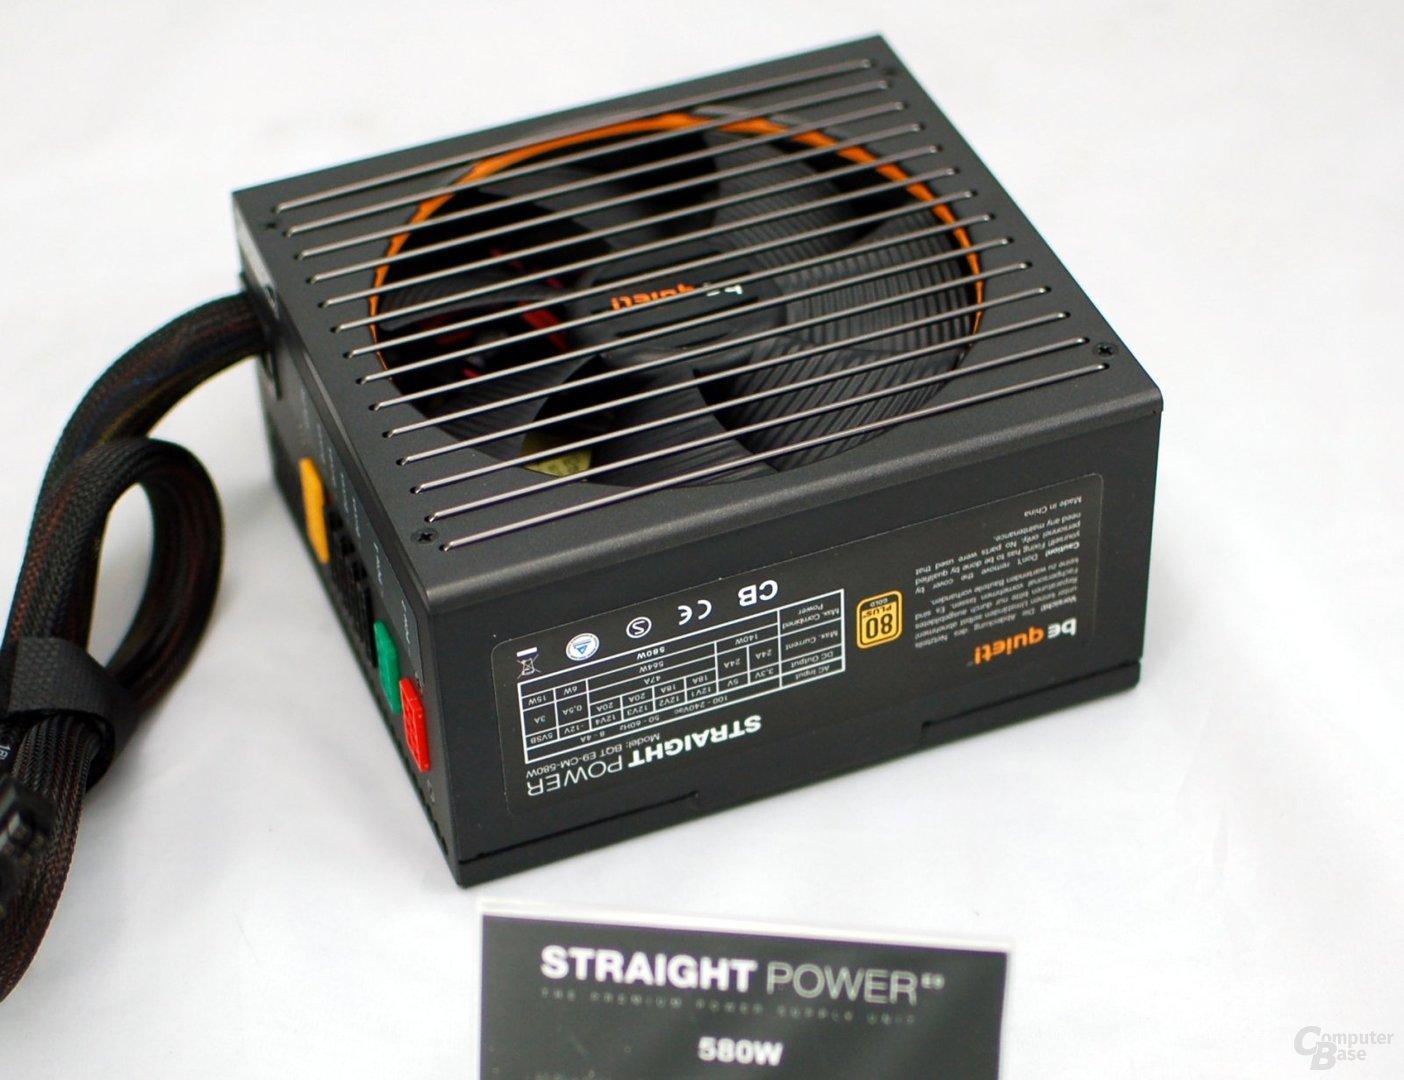 Be Quiet Straight Power 580 Watt